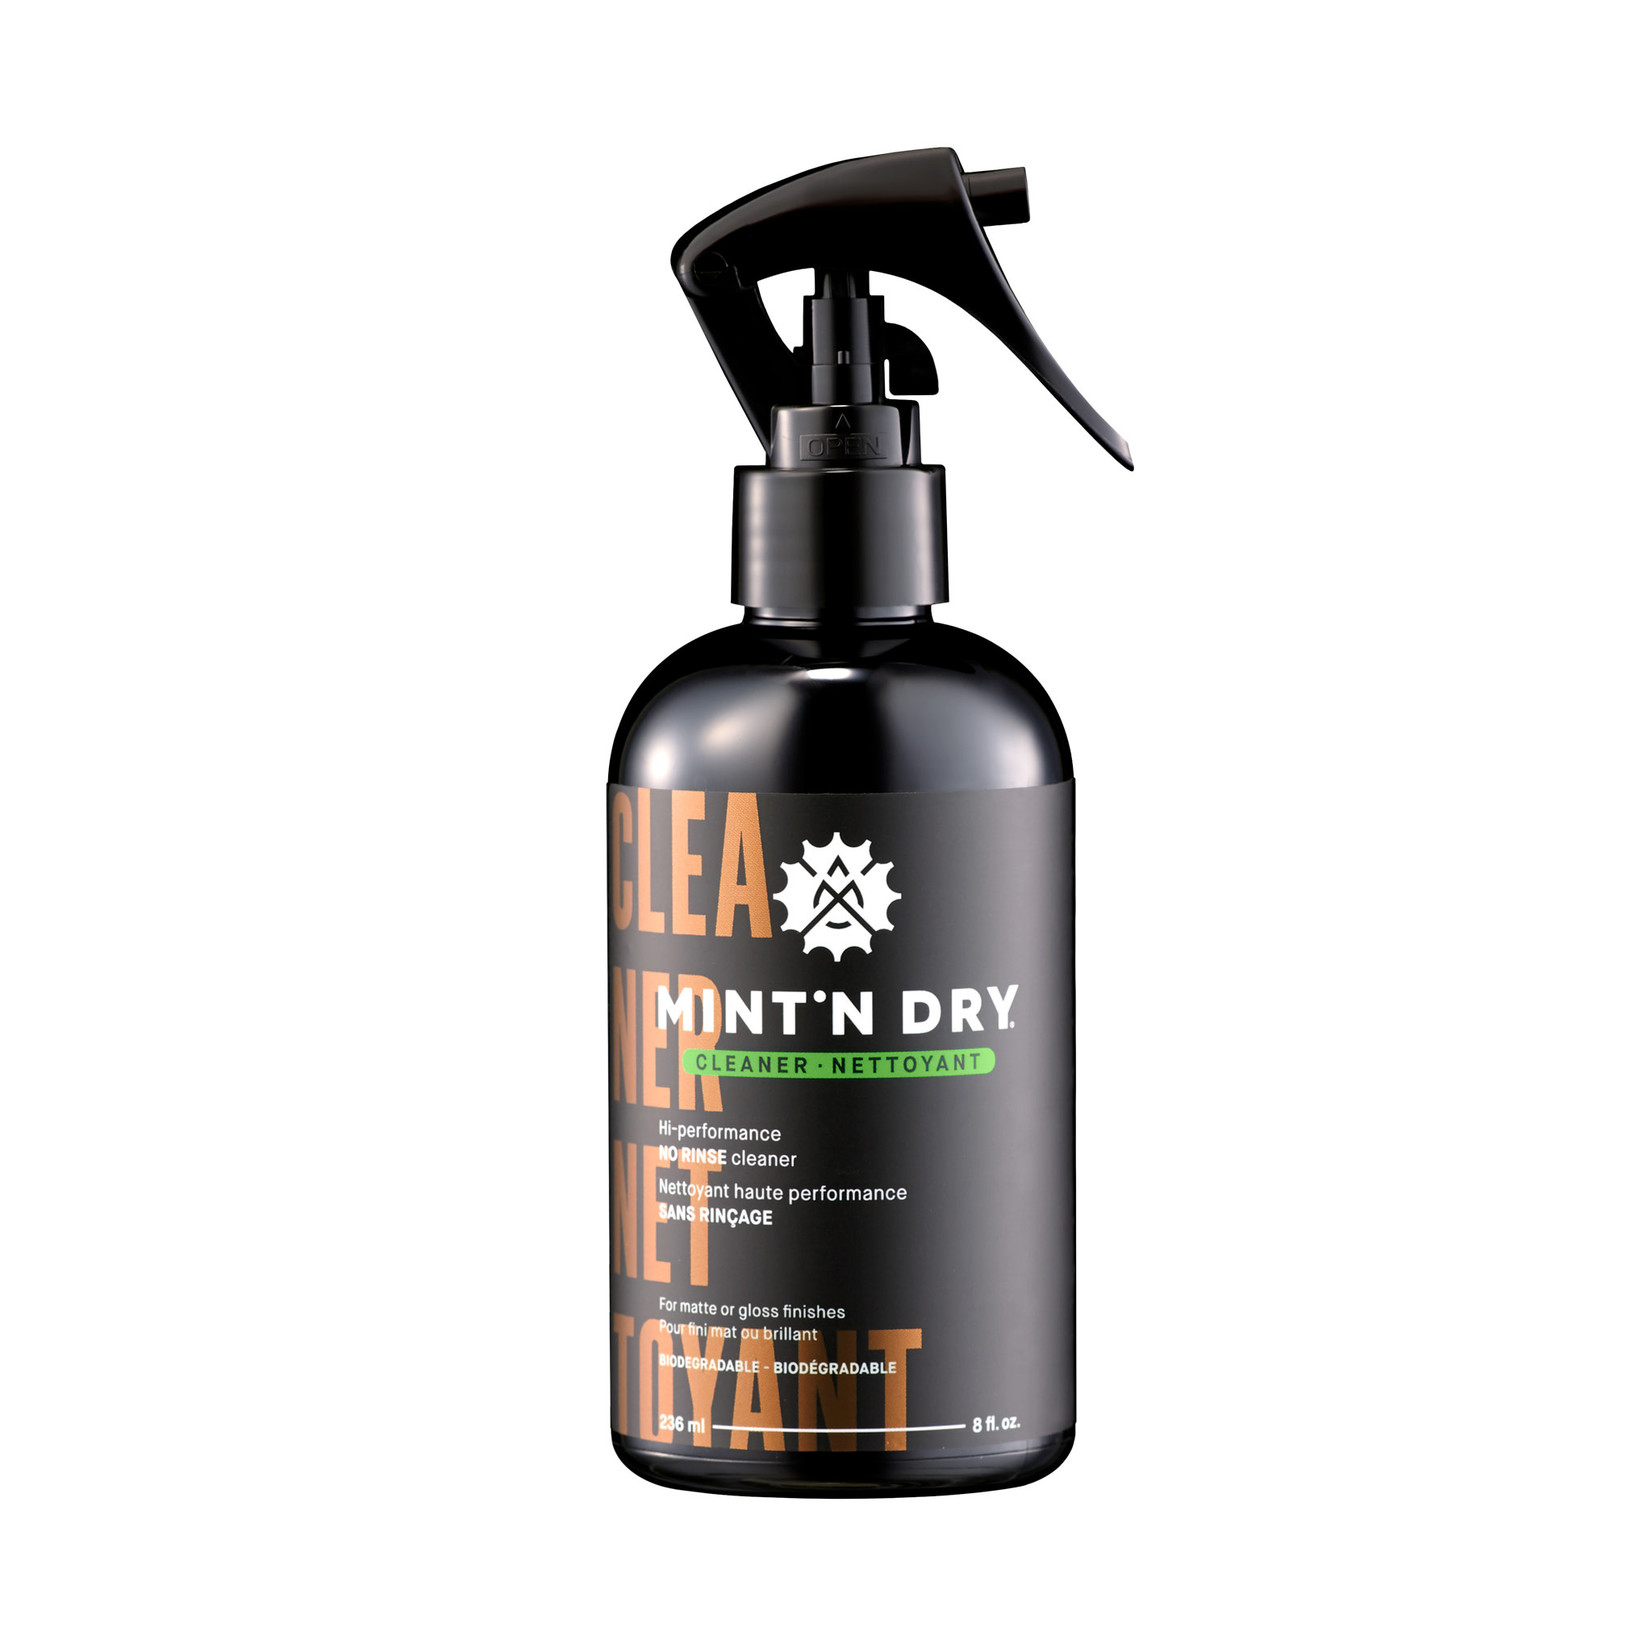 Mint'N Dry Nettoyant sans rinçage 236 ml